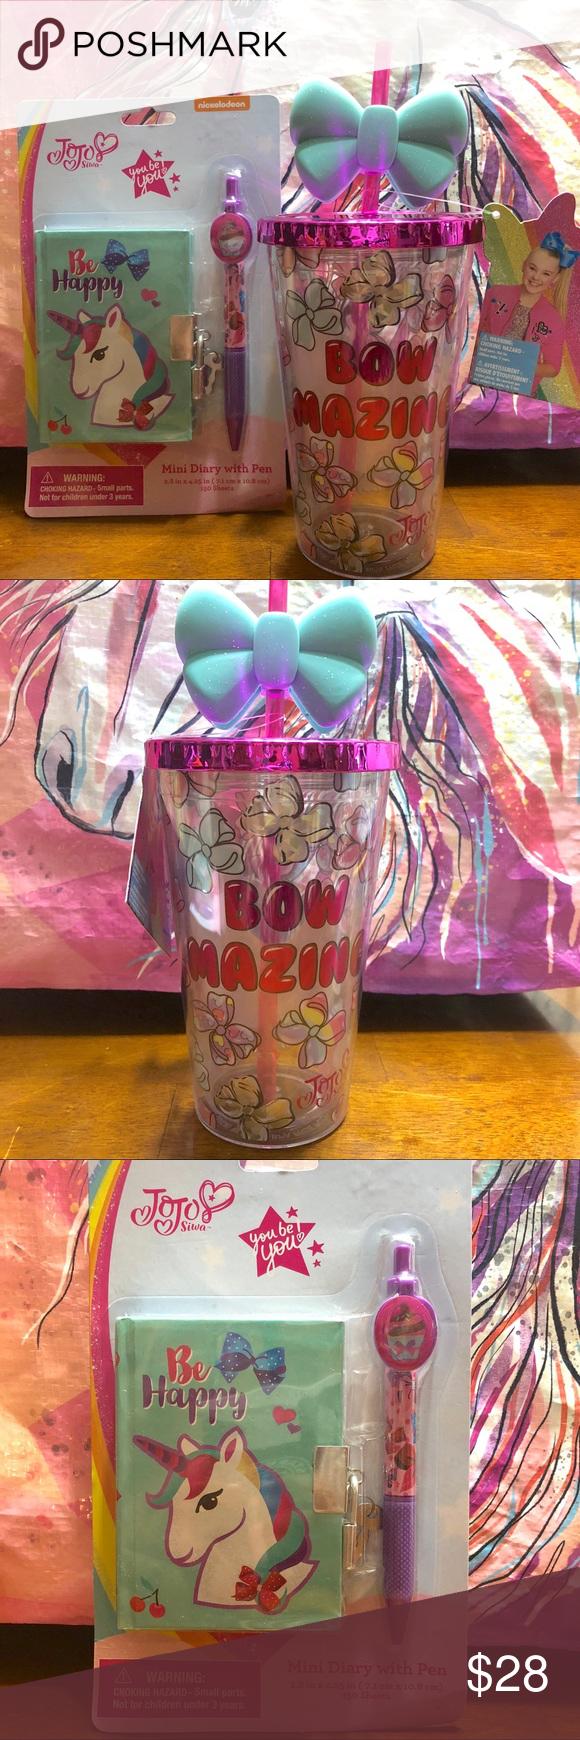 Jojo Siwa Tumbler Cup And Mini Diary Pen Set Jojo Siwa Bows Diary With Lock Tumbler Cups